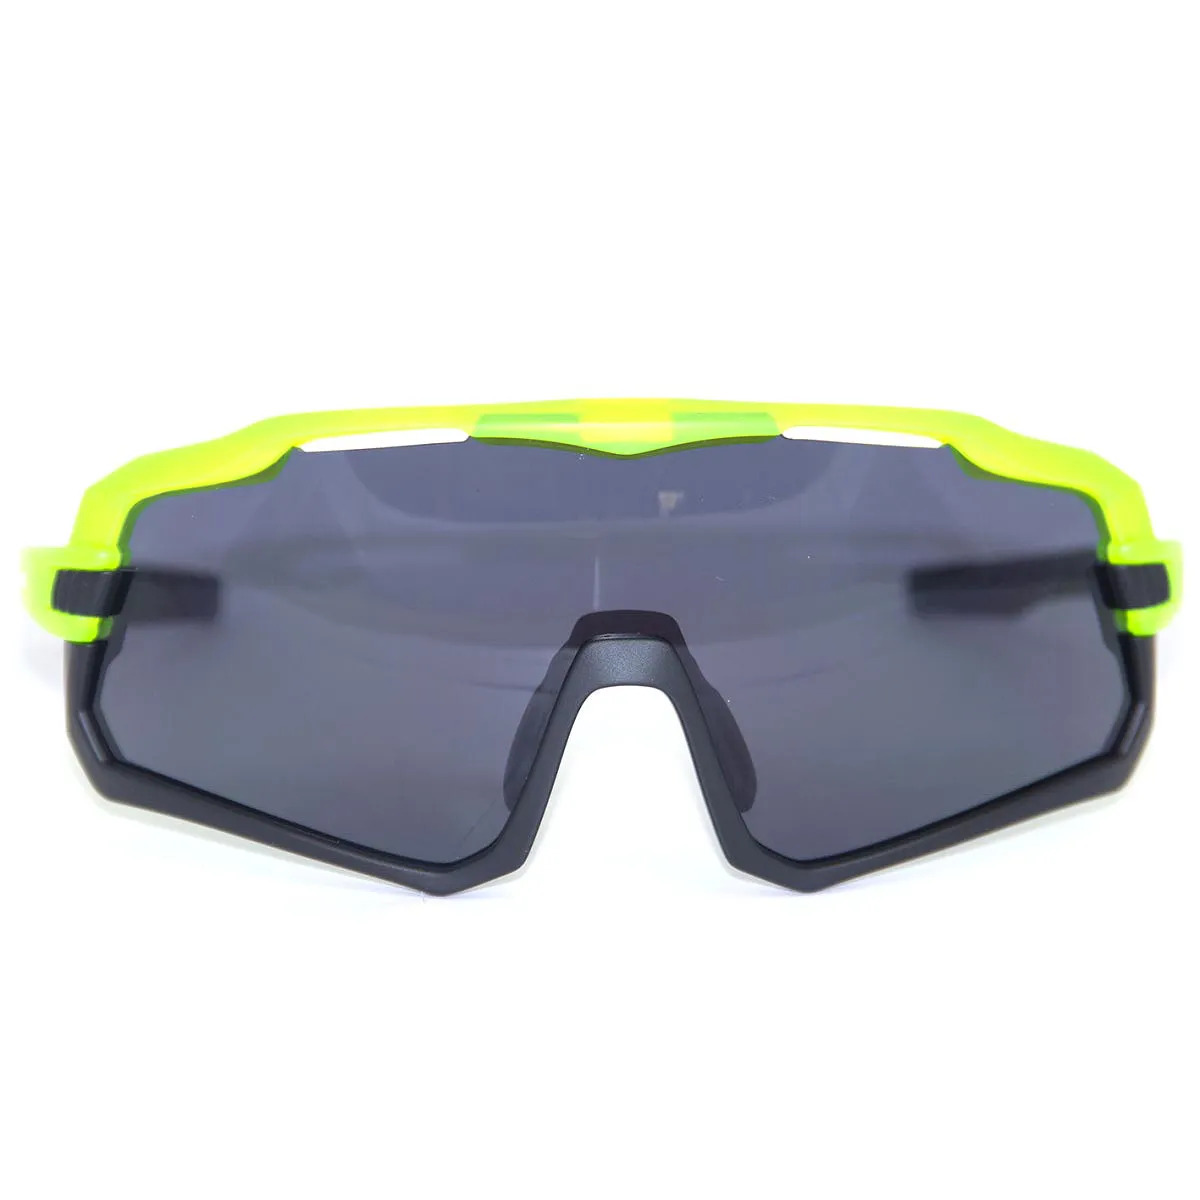 Óculos Ciclismo Mtb Absolute Wild Neon e Preto Fumê